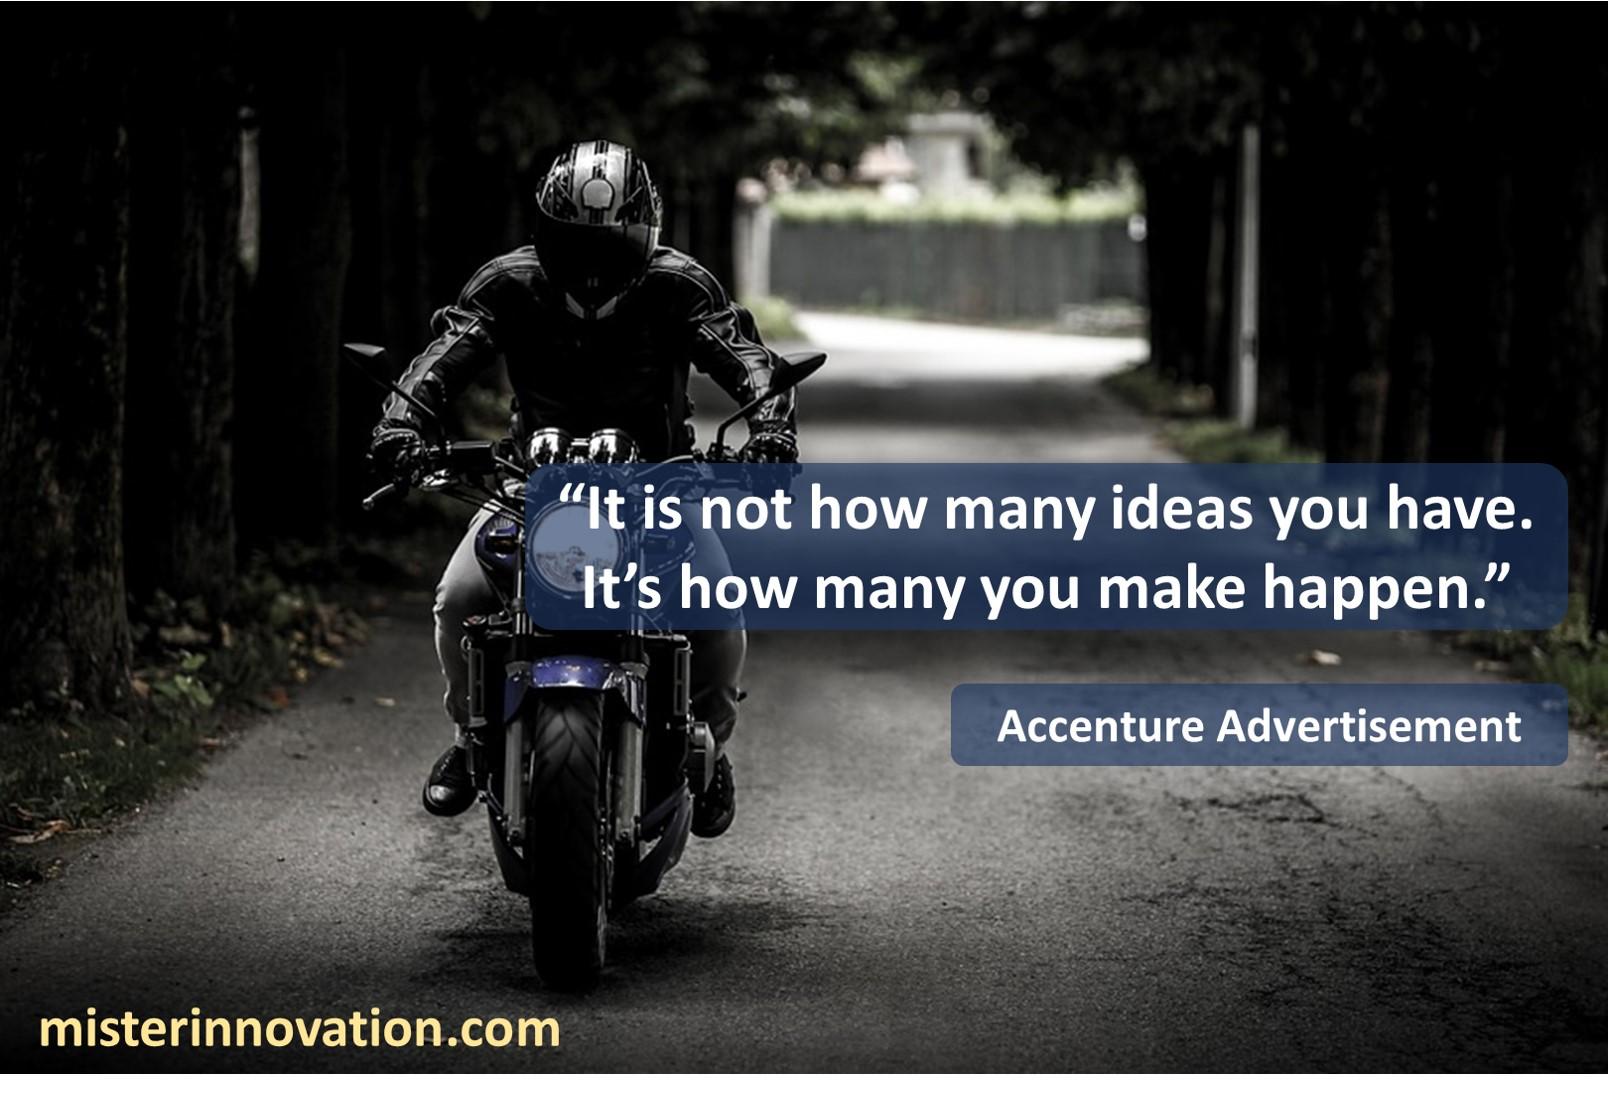 Accenture Advertisement